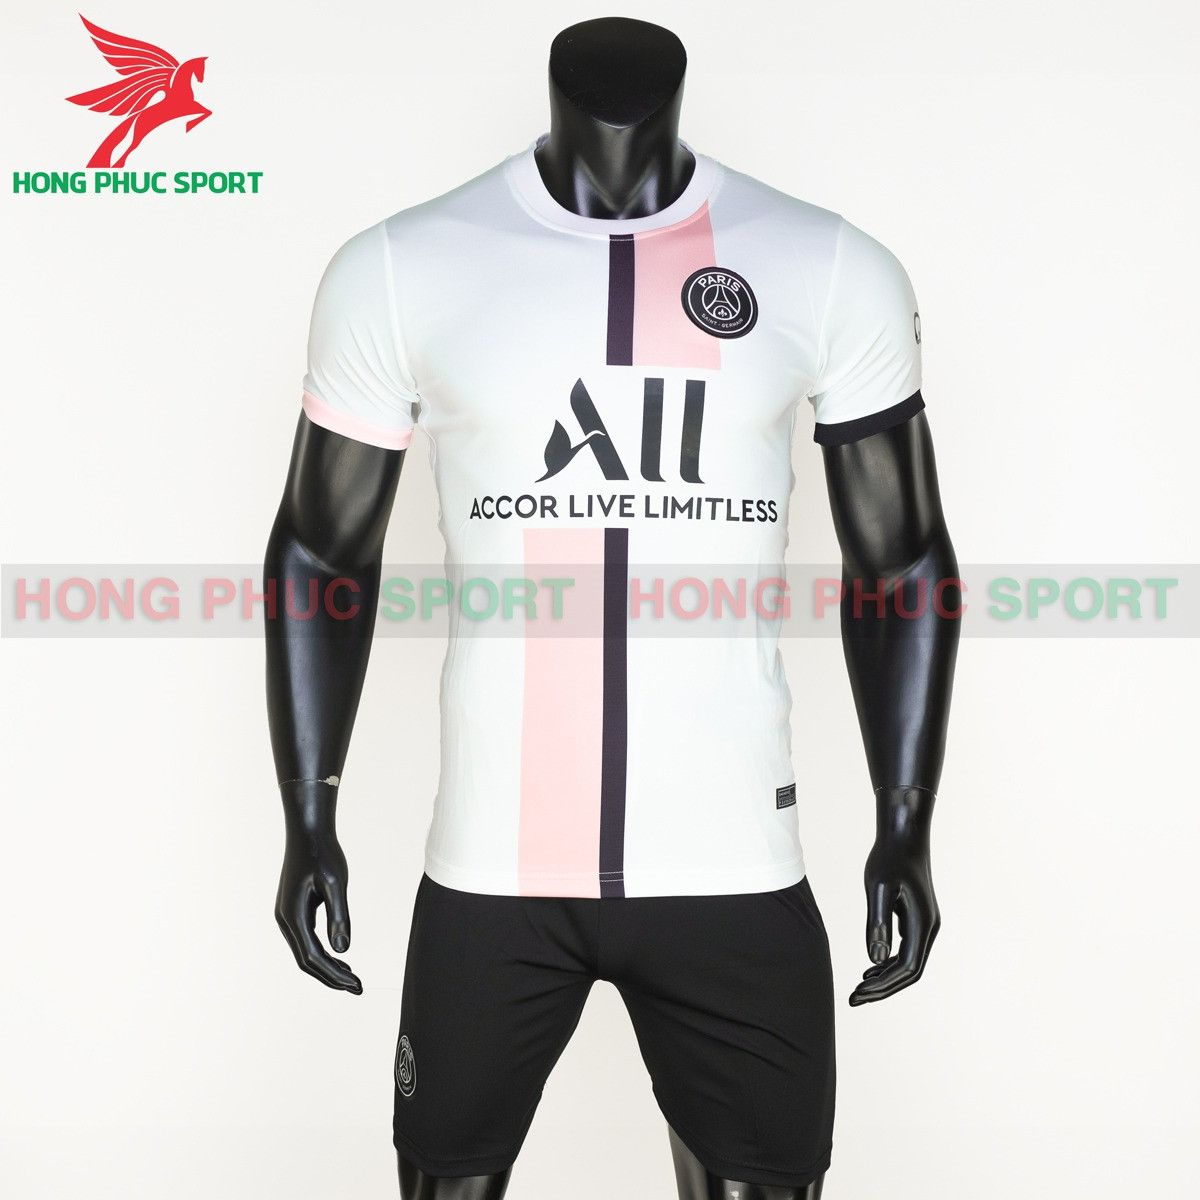 https://cdn.hongphucsport.com/unsafe/s4.shopbay.vn/files/285/ao-dau-psg-2021-2022-san-khach-thailand-1-6149b419c0ab2.jpg